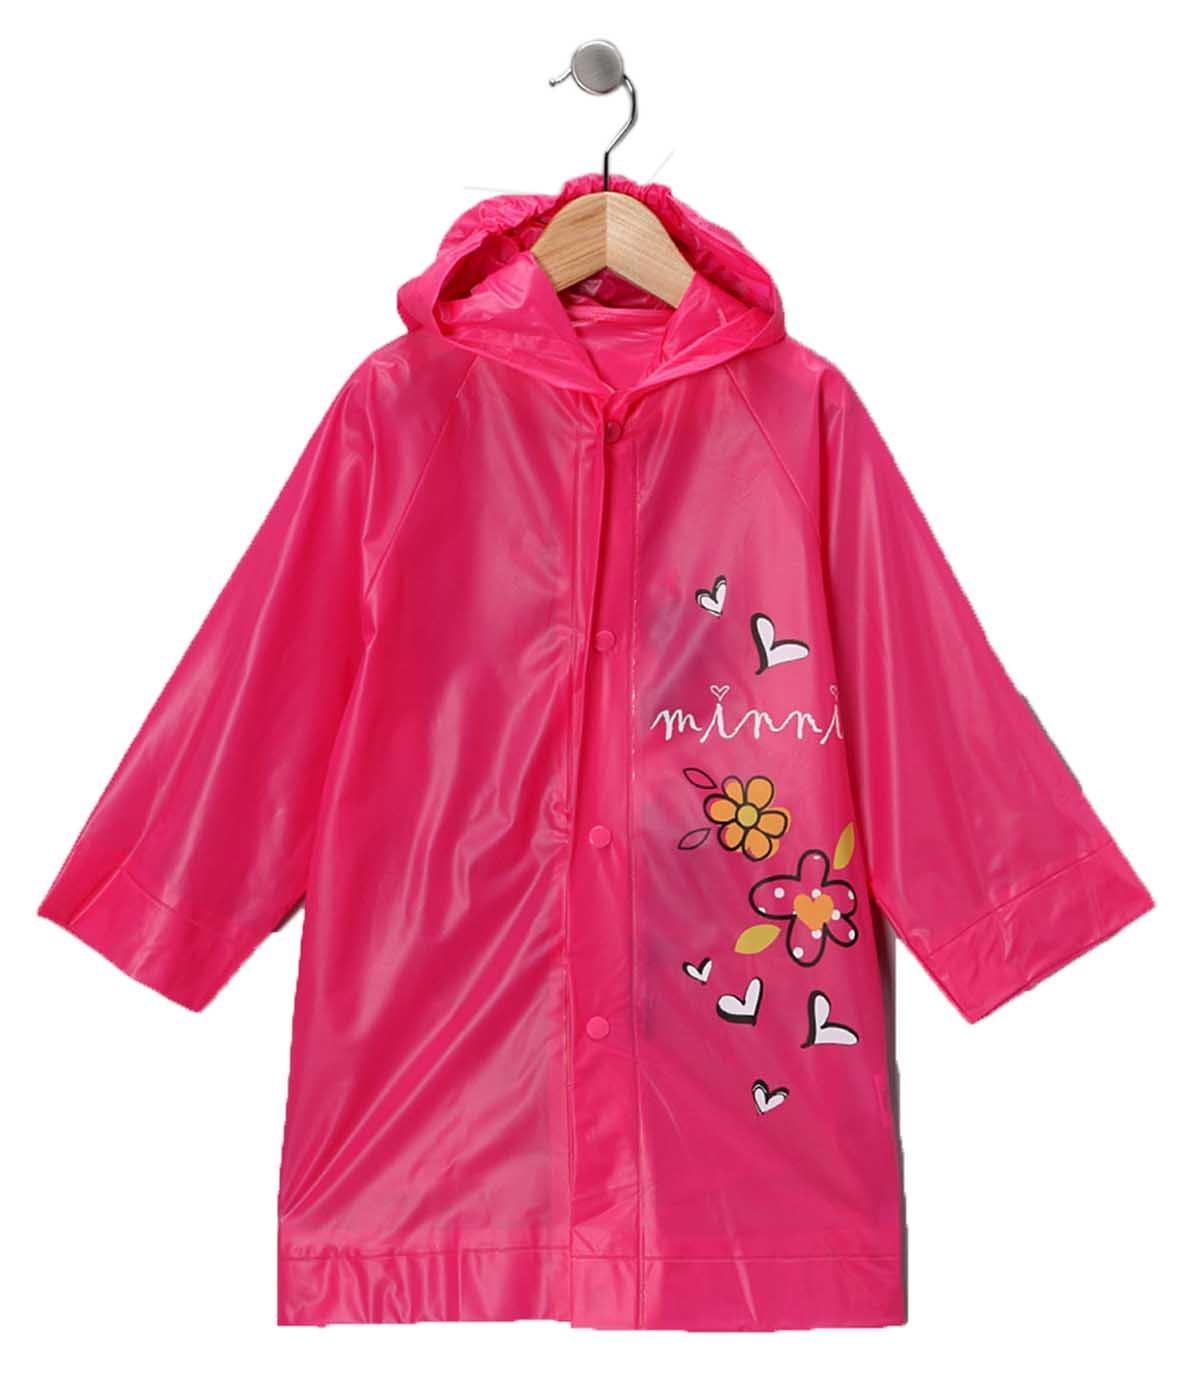 Disney Minnie Mouse Girl's Pink Rain Slicker Size Large 6/7